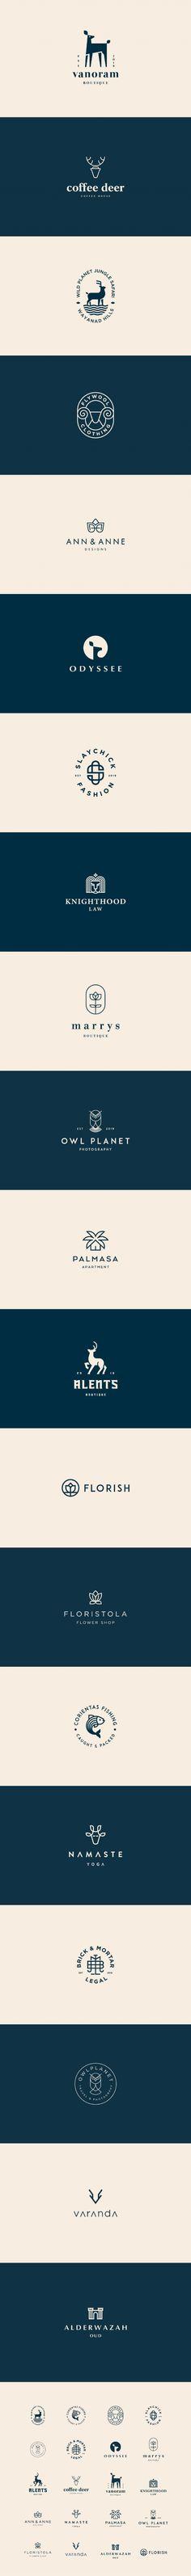 Best Brand Identity Designs Of The Week 21 - Graphic Design Inspiration Brand Identity Design, Icon Design, Branding Design, Create Logo Design, Elegant Logo, Print Layout, Social Media Design, Cool Logo, Graphic Design Inspiration